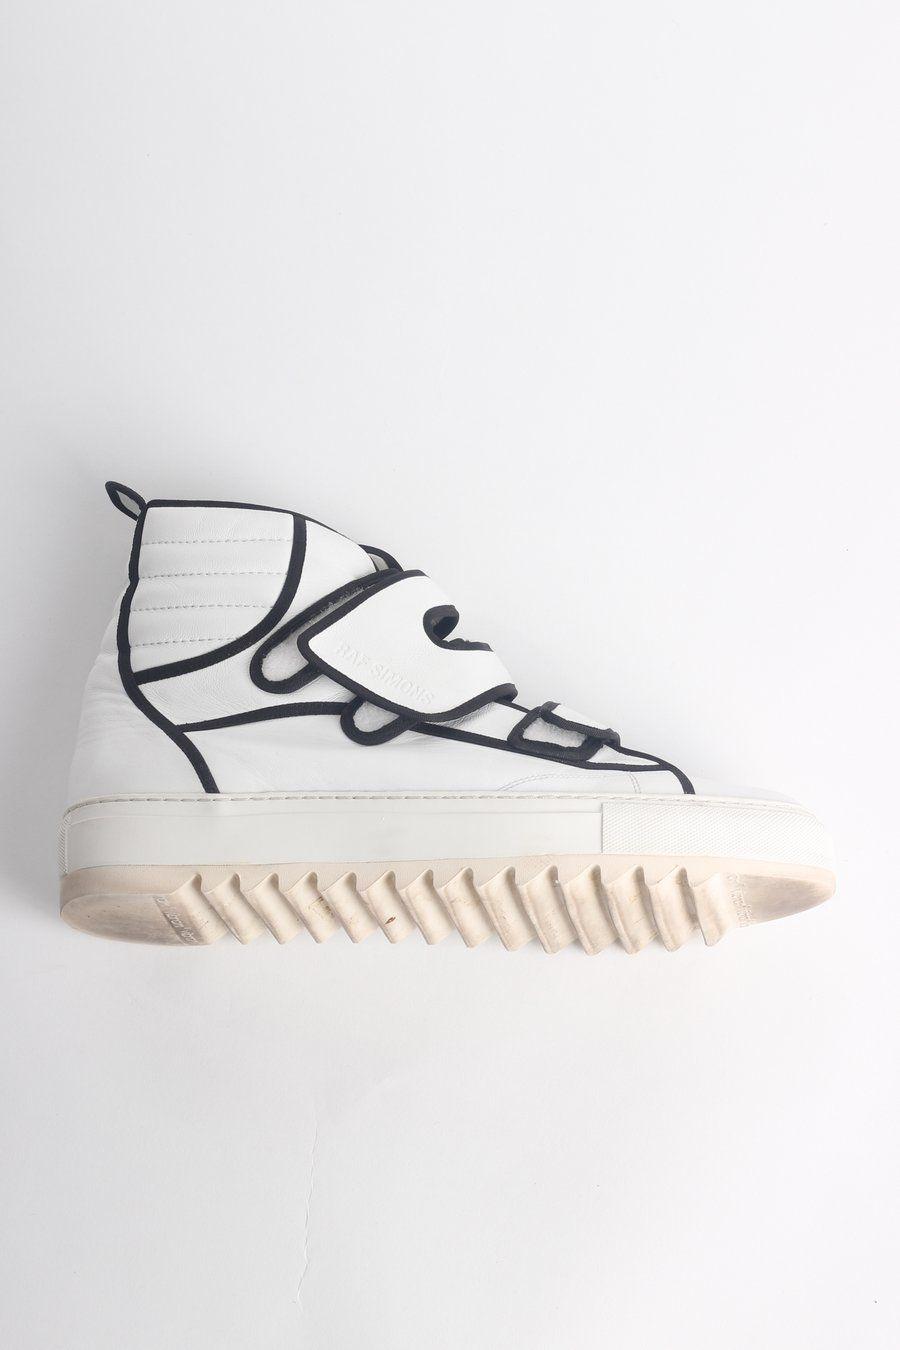 5952fad3a35d RAF SIMONS Velcro Fastening Hi-top Sneakers EU 44  UK 10